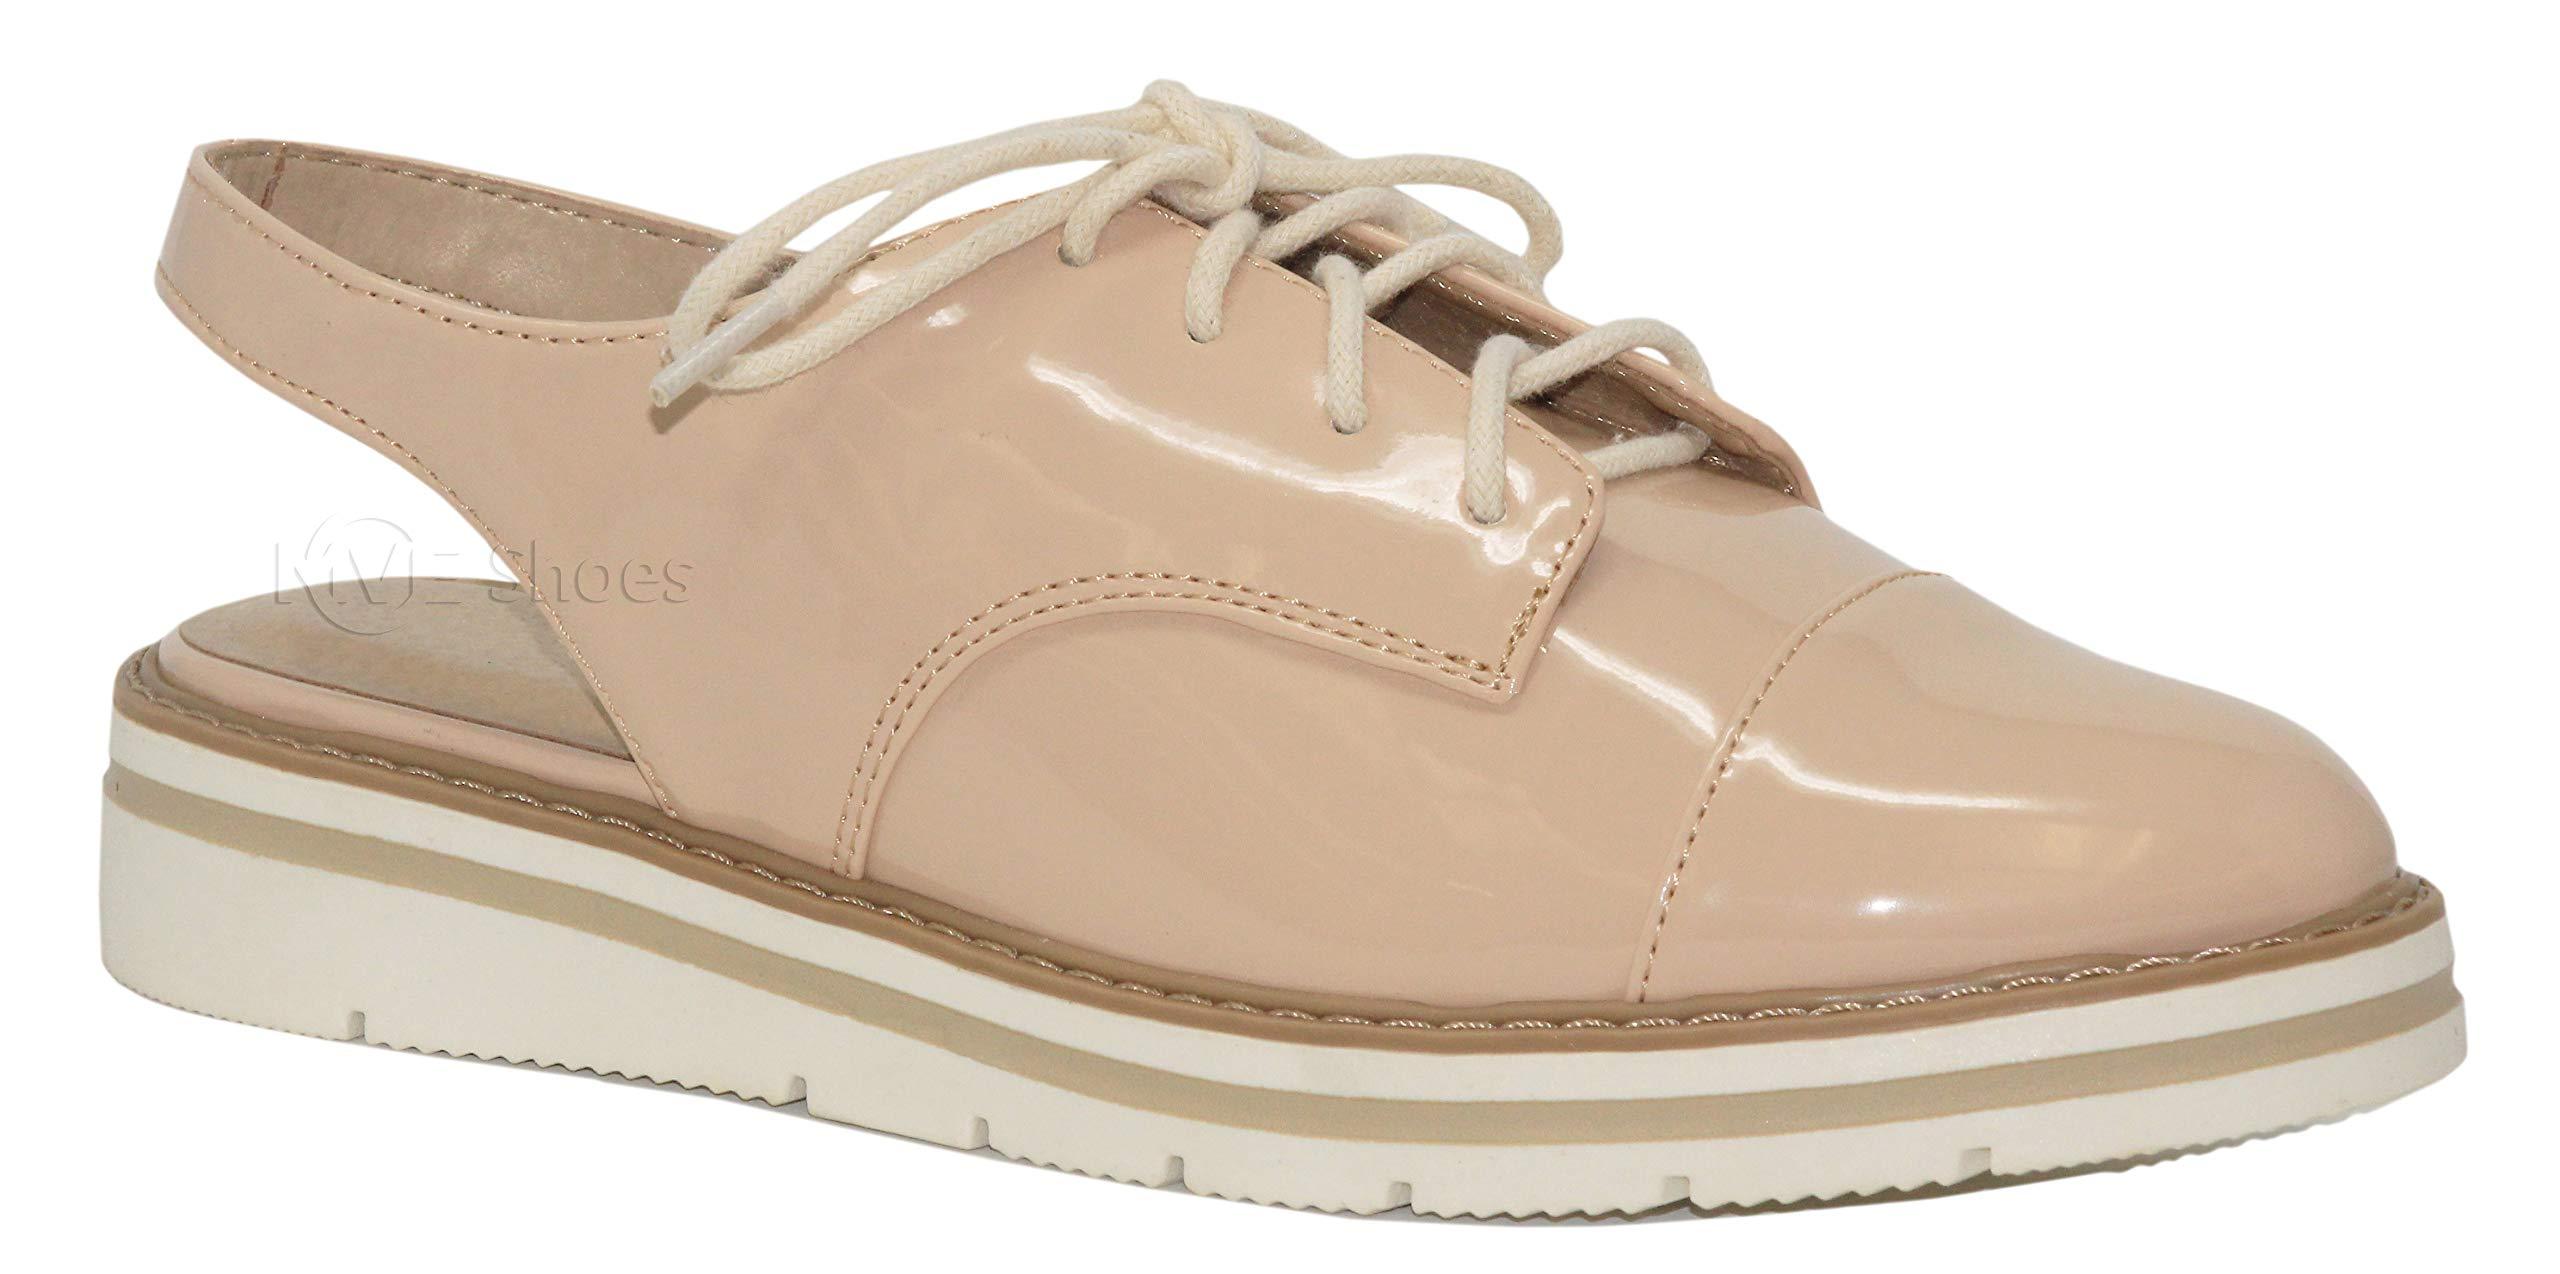 99b765f7ecf MVE Shoes Women s Casual Peep Toe Ankle Strap Sandals - Cute Summer ...